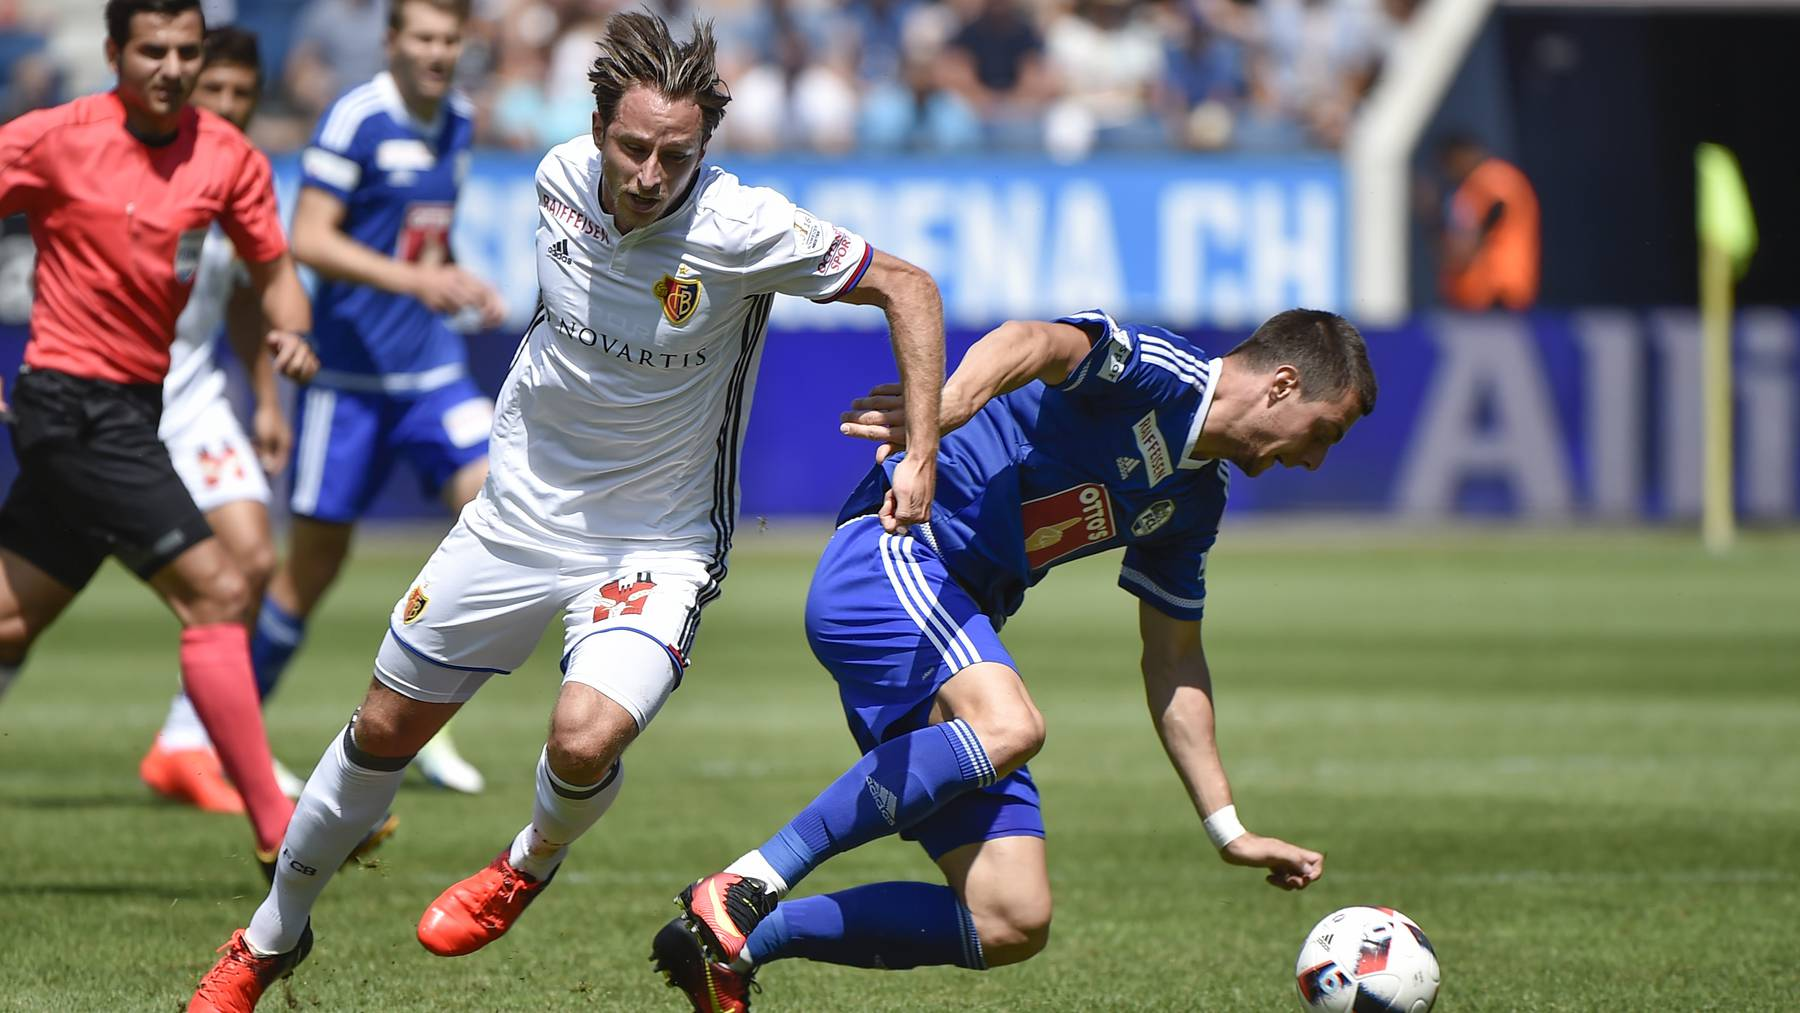 FCL - FCB: Zwei Mannschaften in starker Form